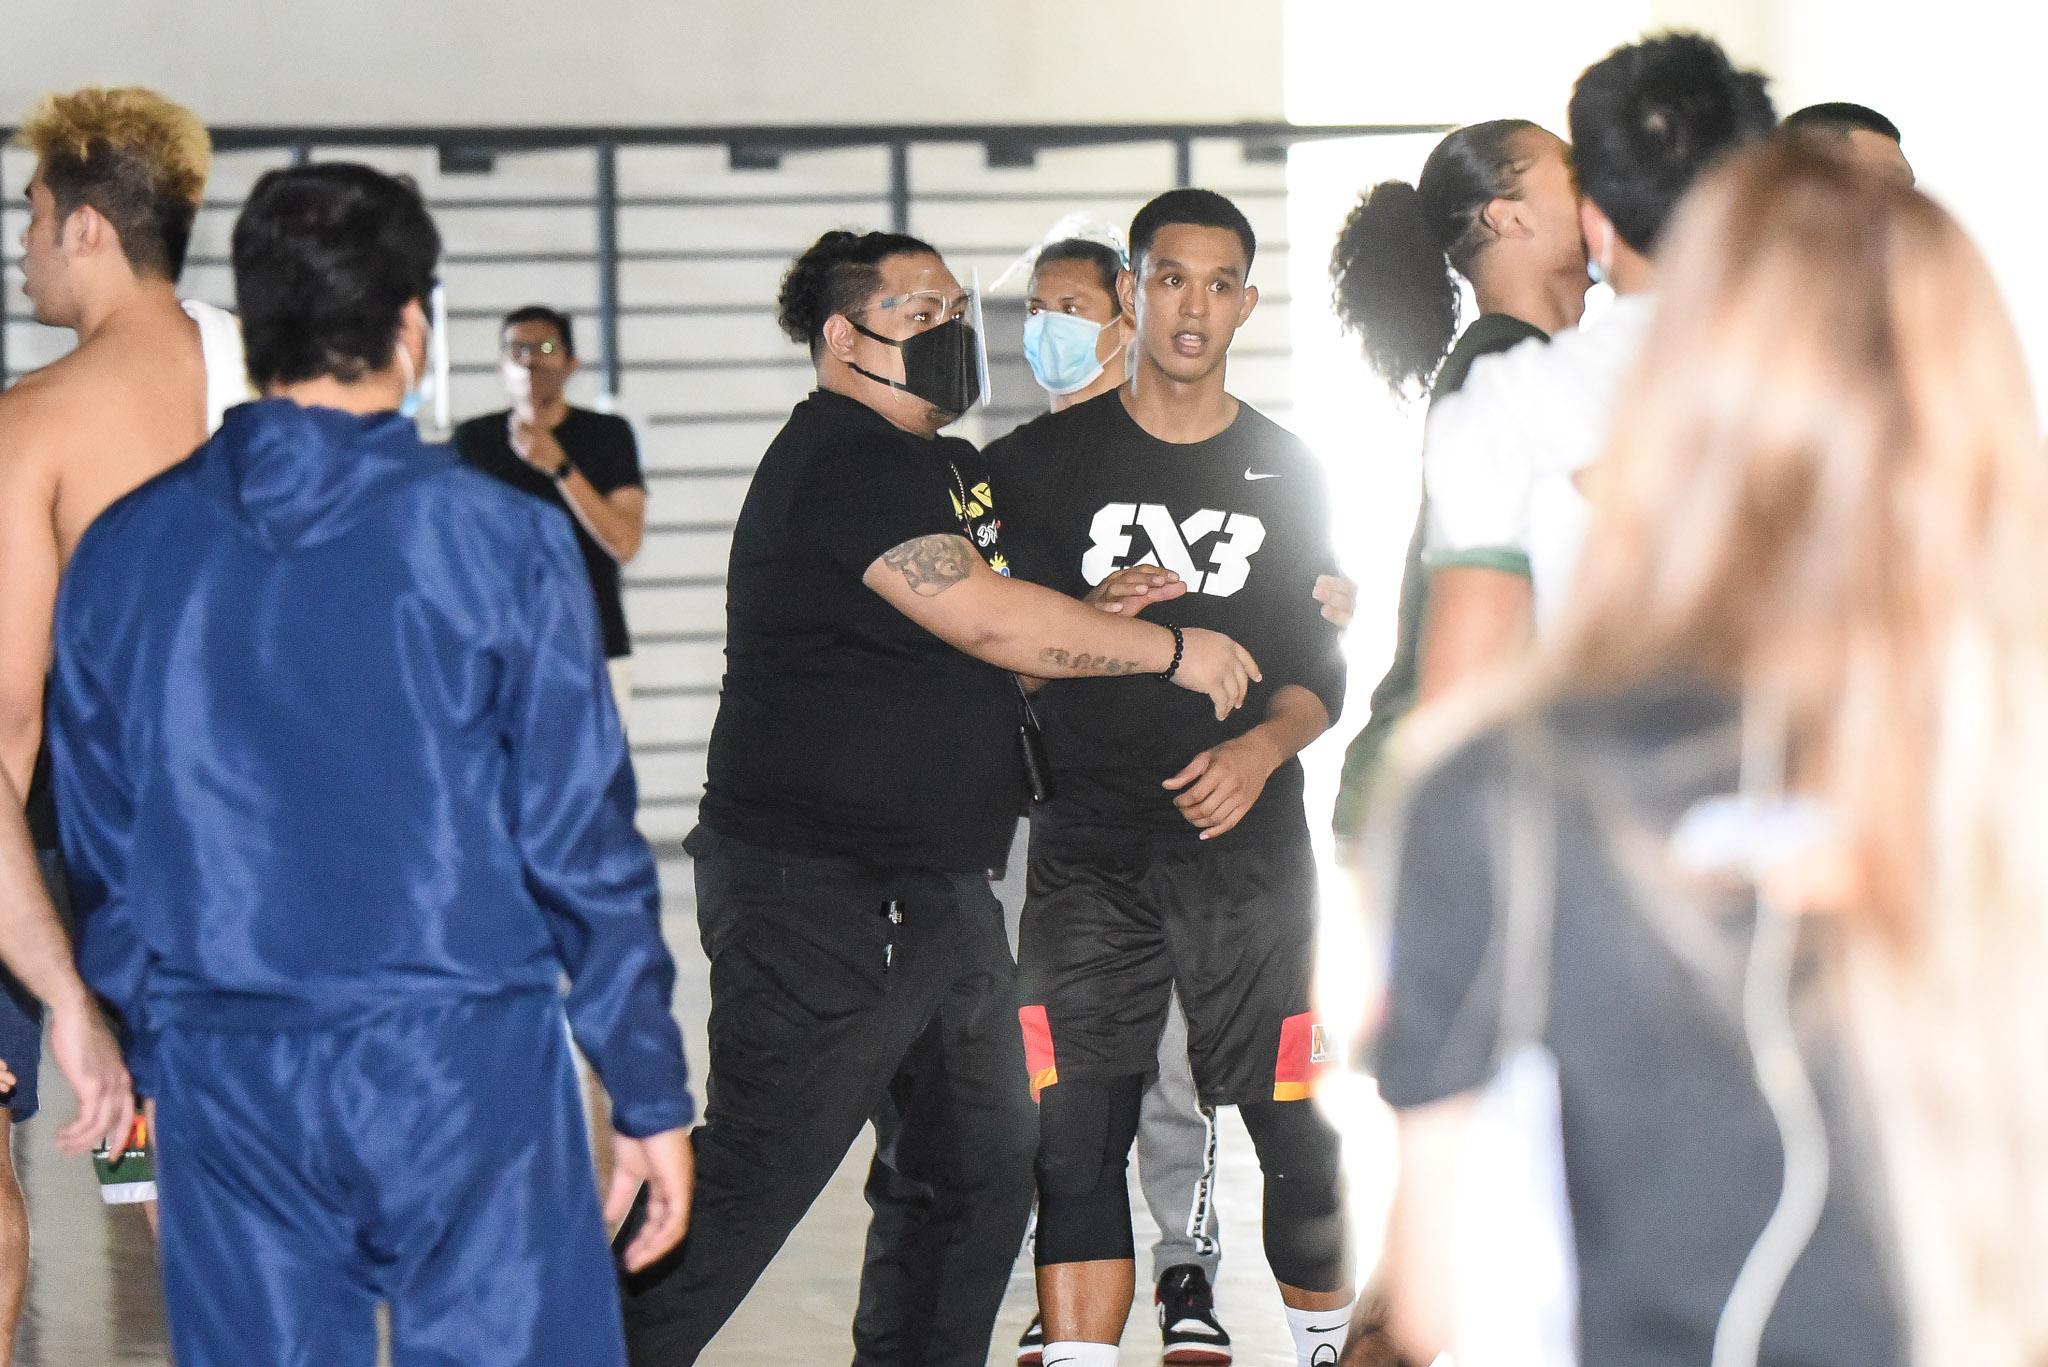 Chooks-to-Go-Pilipinas-3X3-Scuffle-2 In-game trash talk led to Nueva Ecija-Butuan backstage scuffle 3x3 Basketball Chooks-to-Go Pilipinas 3x3 News  - philippine sports news